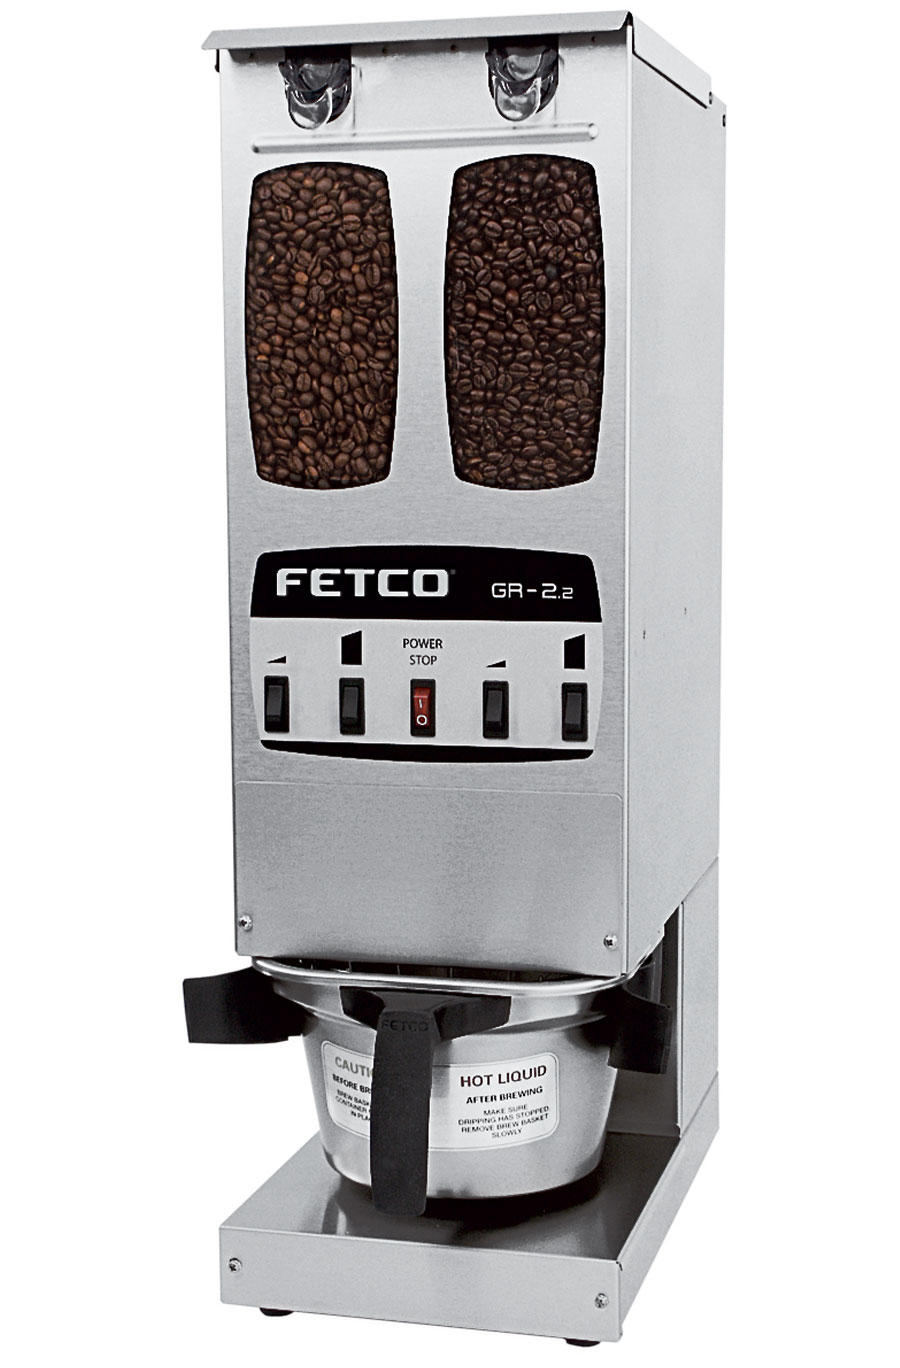 Fetco GR 2.2